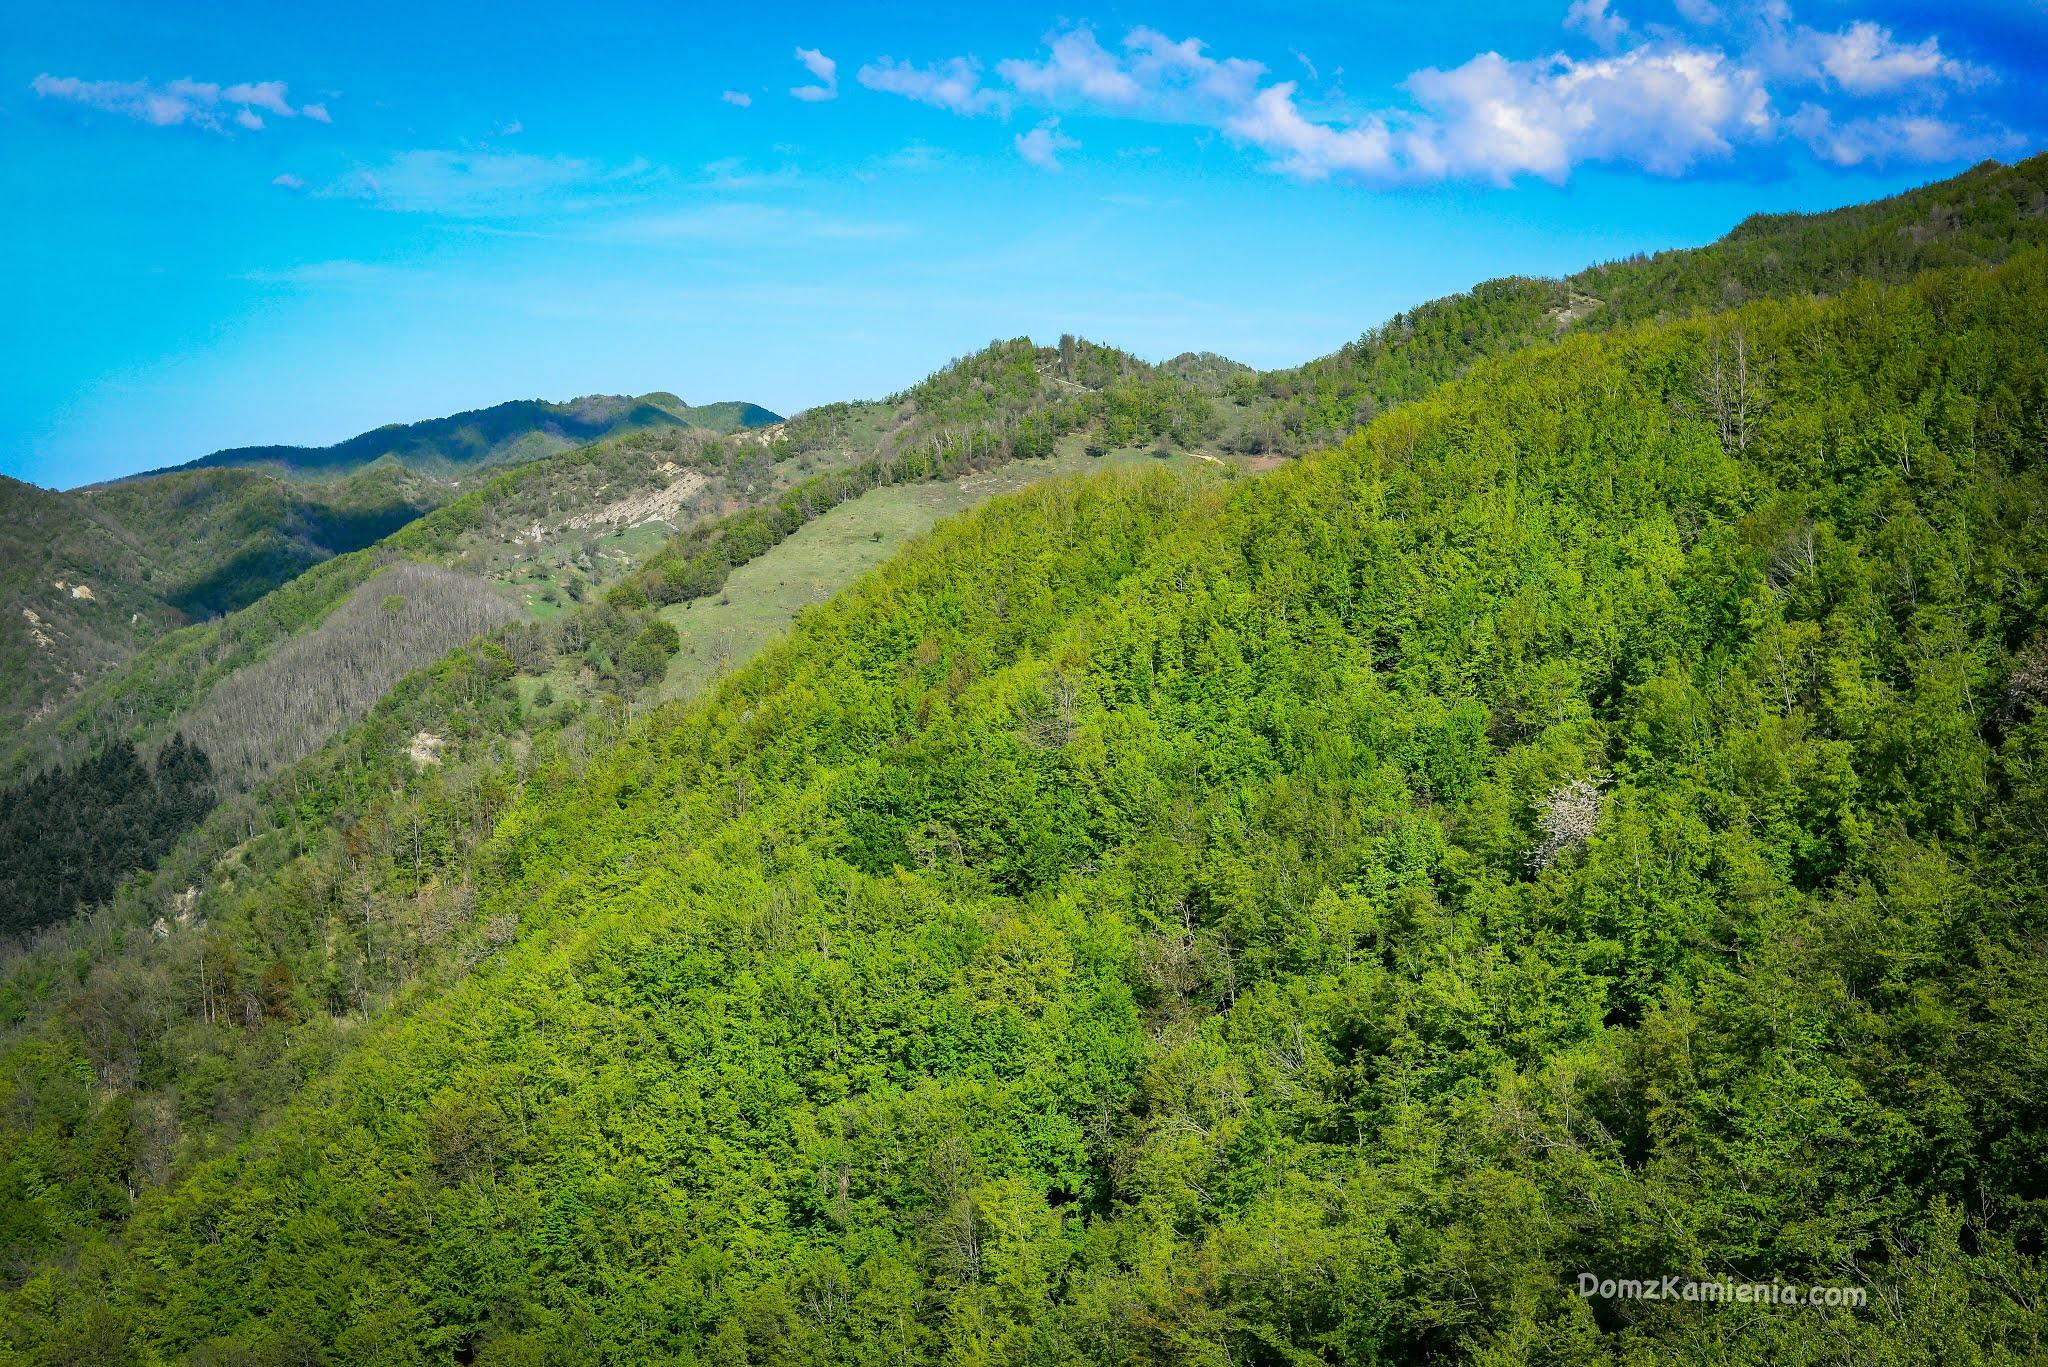 Trekking Toskania, monte Lavane, Marradi, blog Dom z Kamienia